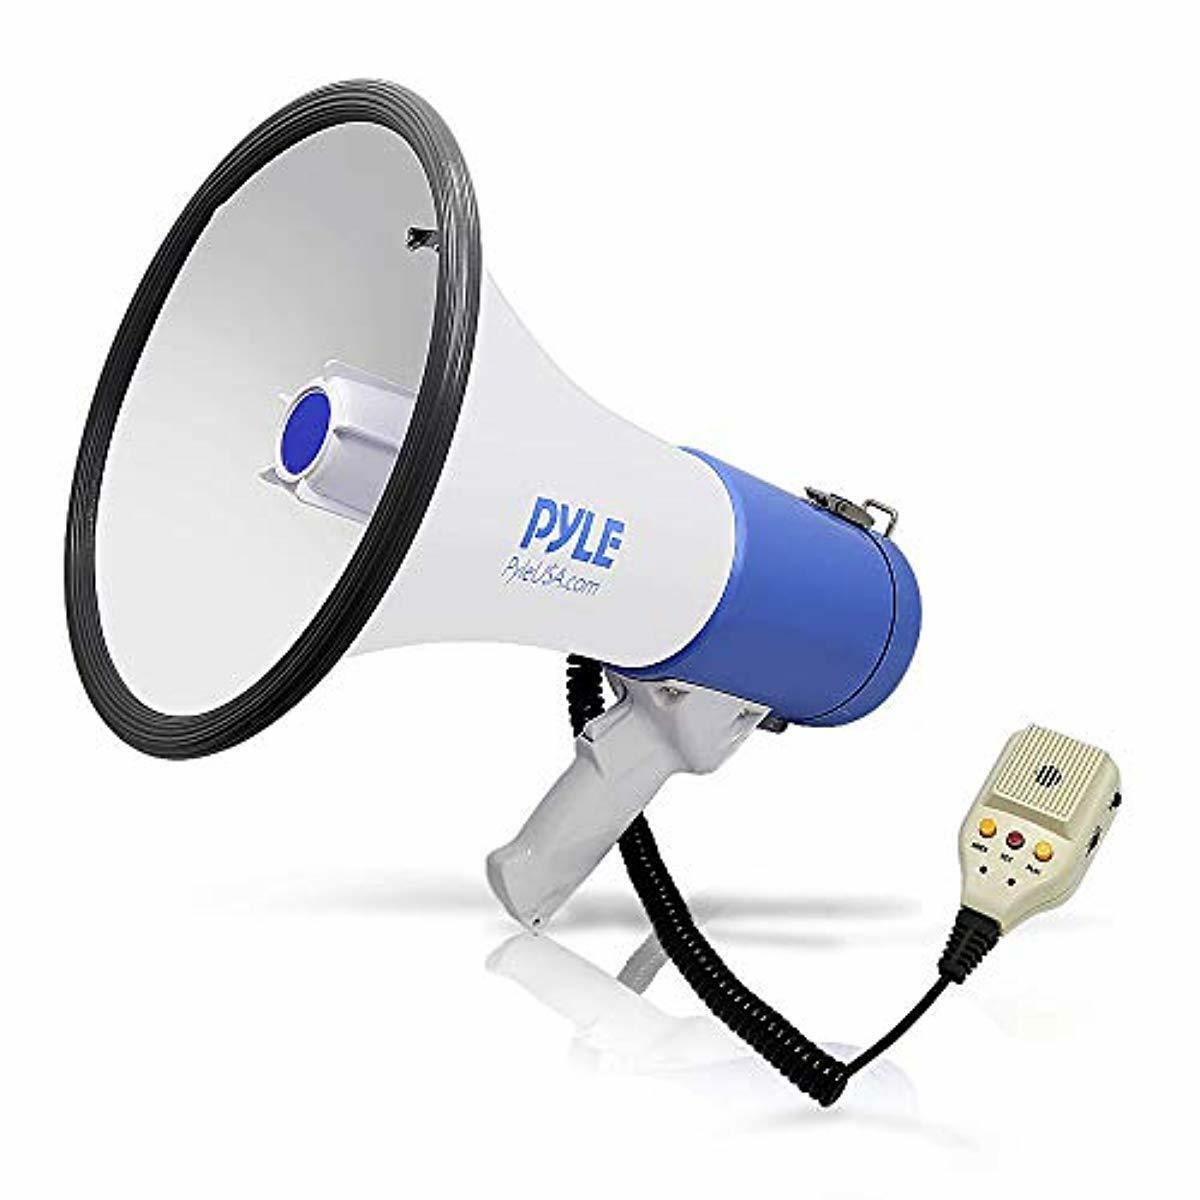 Pyle Megaphone PA Bullhorn Speaker - Built-in Siren 50 Watts